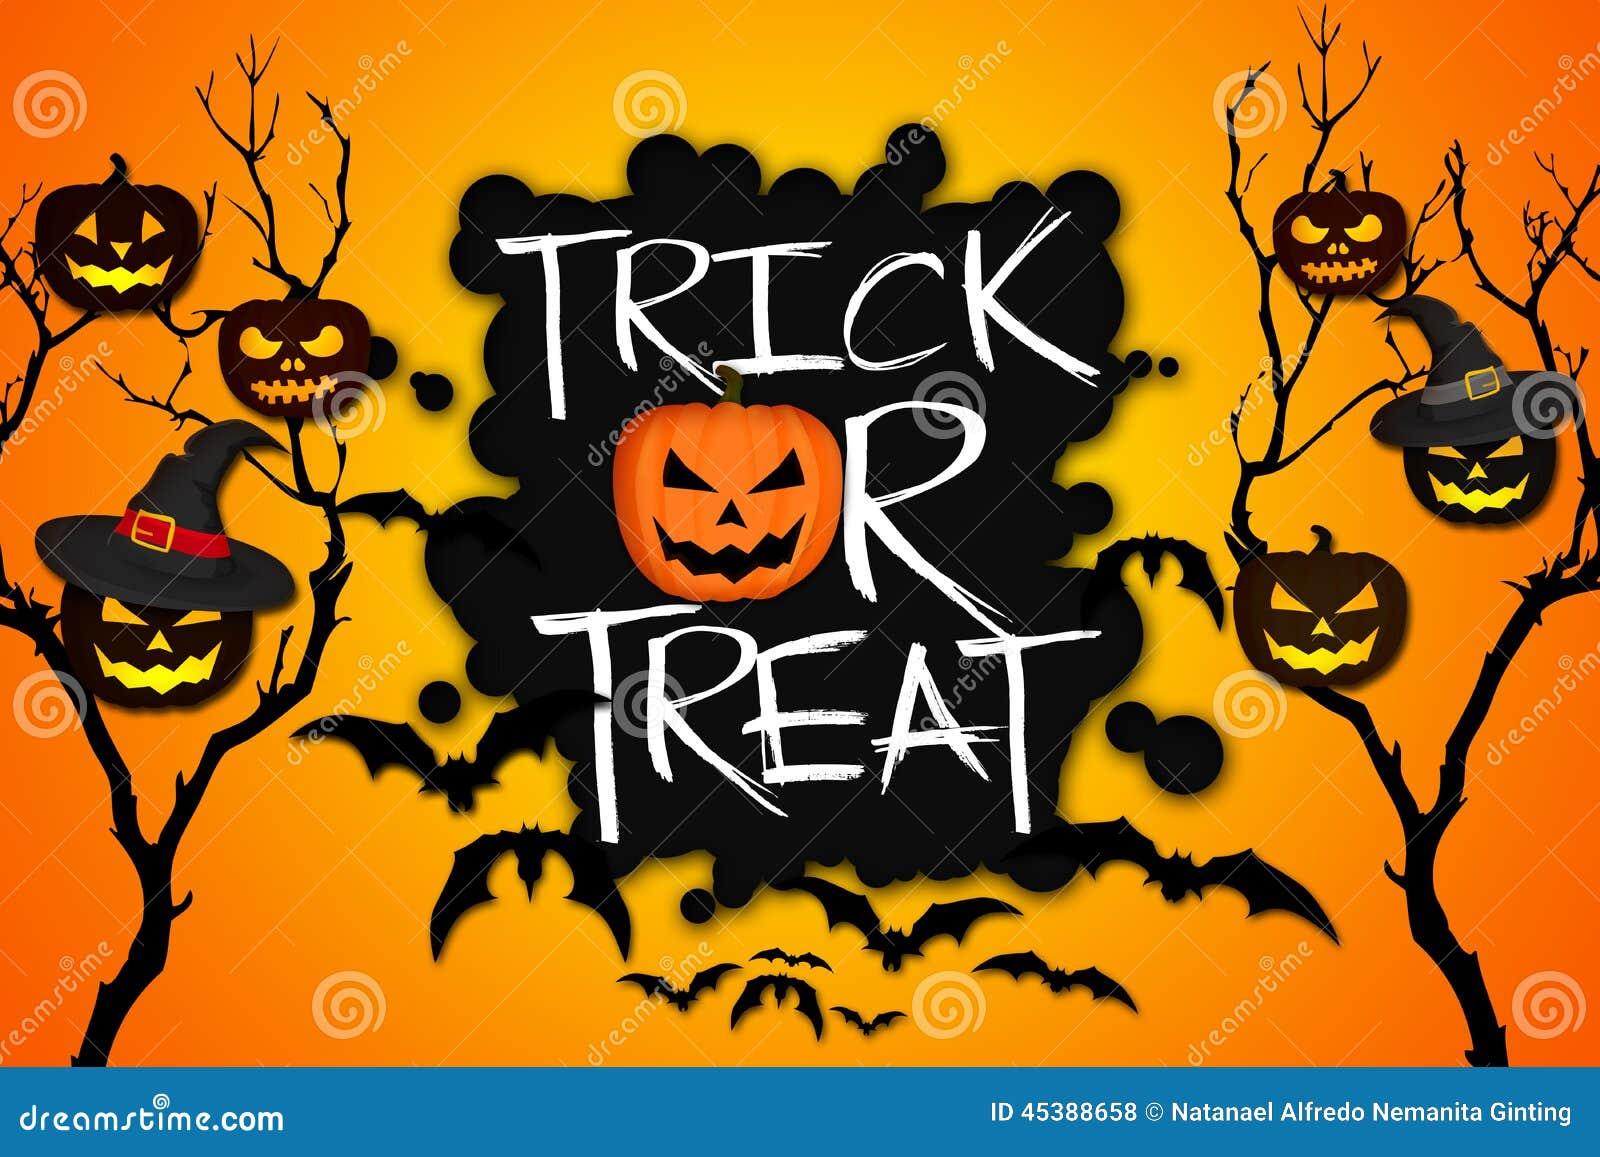 Süßes Sonst Gibt\'s Saures Baum-Halloween-Kürbis-Schläger-Orangen ...